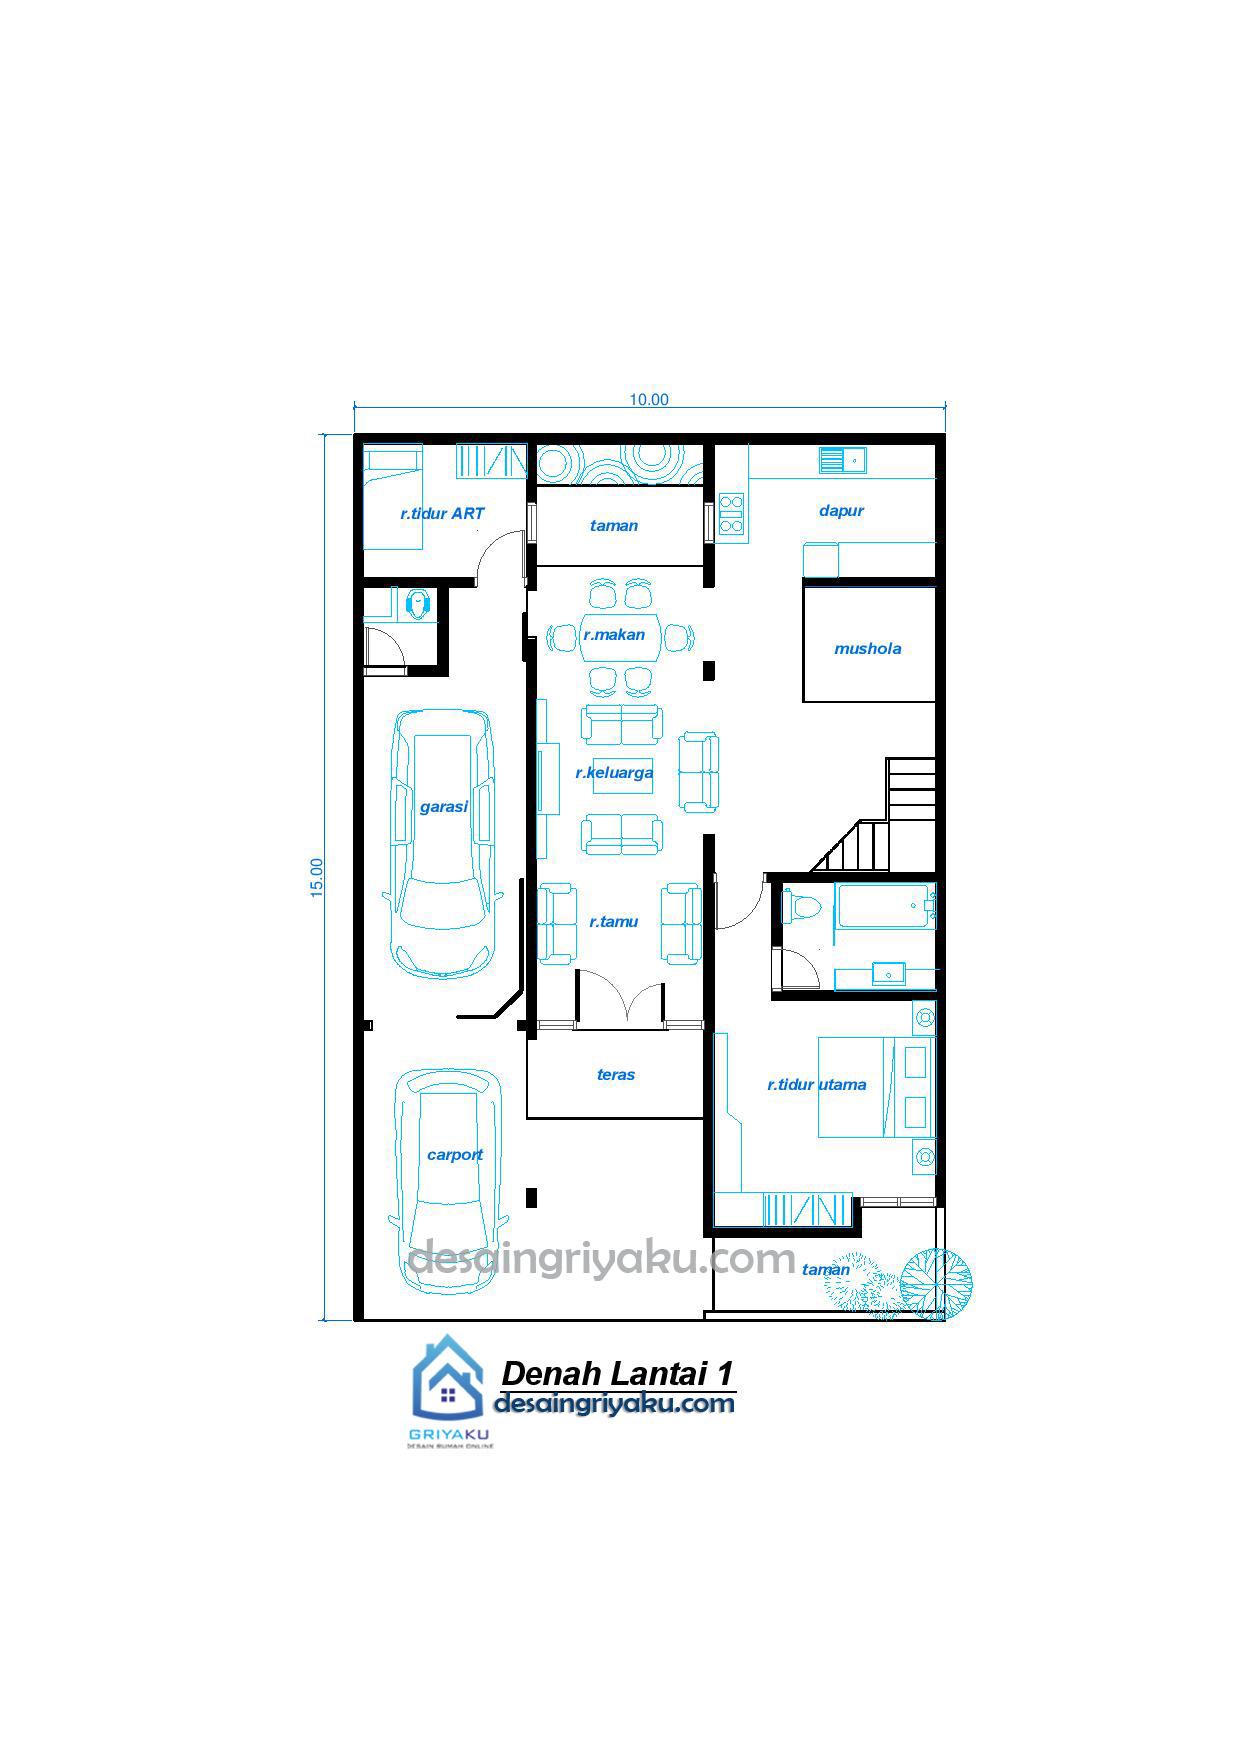 denah lt1 Rumah 10x15 Minimalis 2 lantai